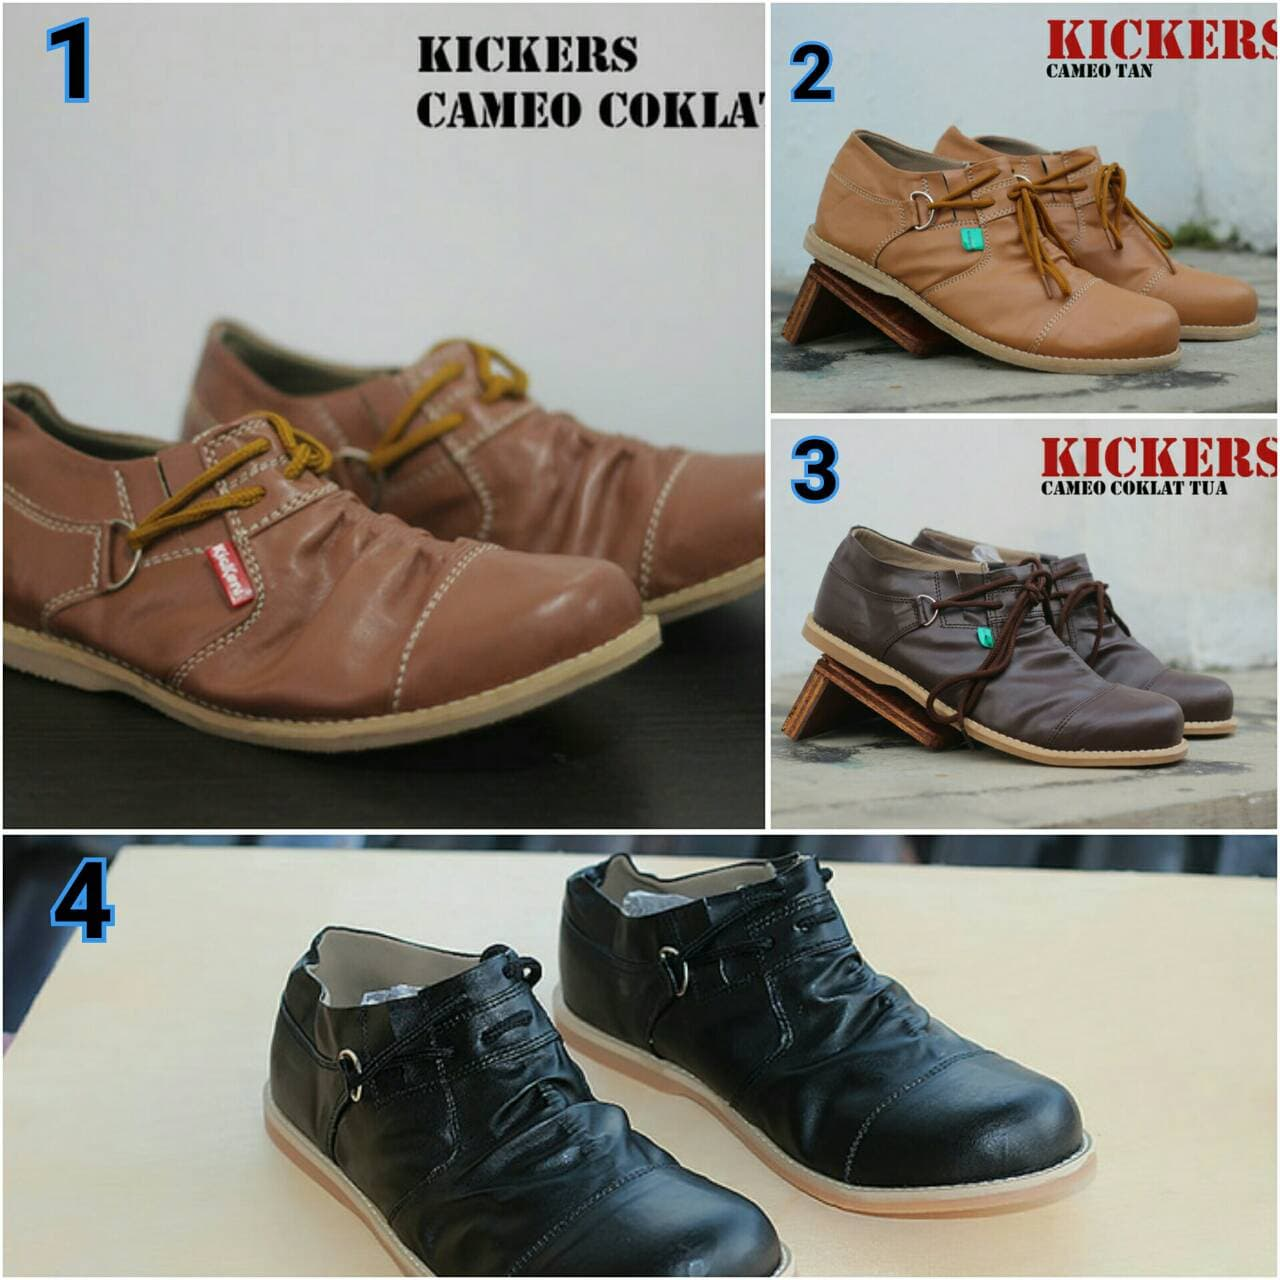 Jual Sepatu Casual Pria Slip on Kickers Wringkle Cameo Termurah - Cokelat  Tua 2ae62bc7e6